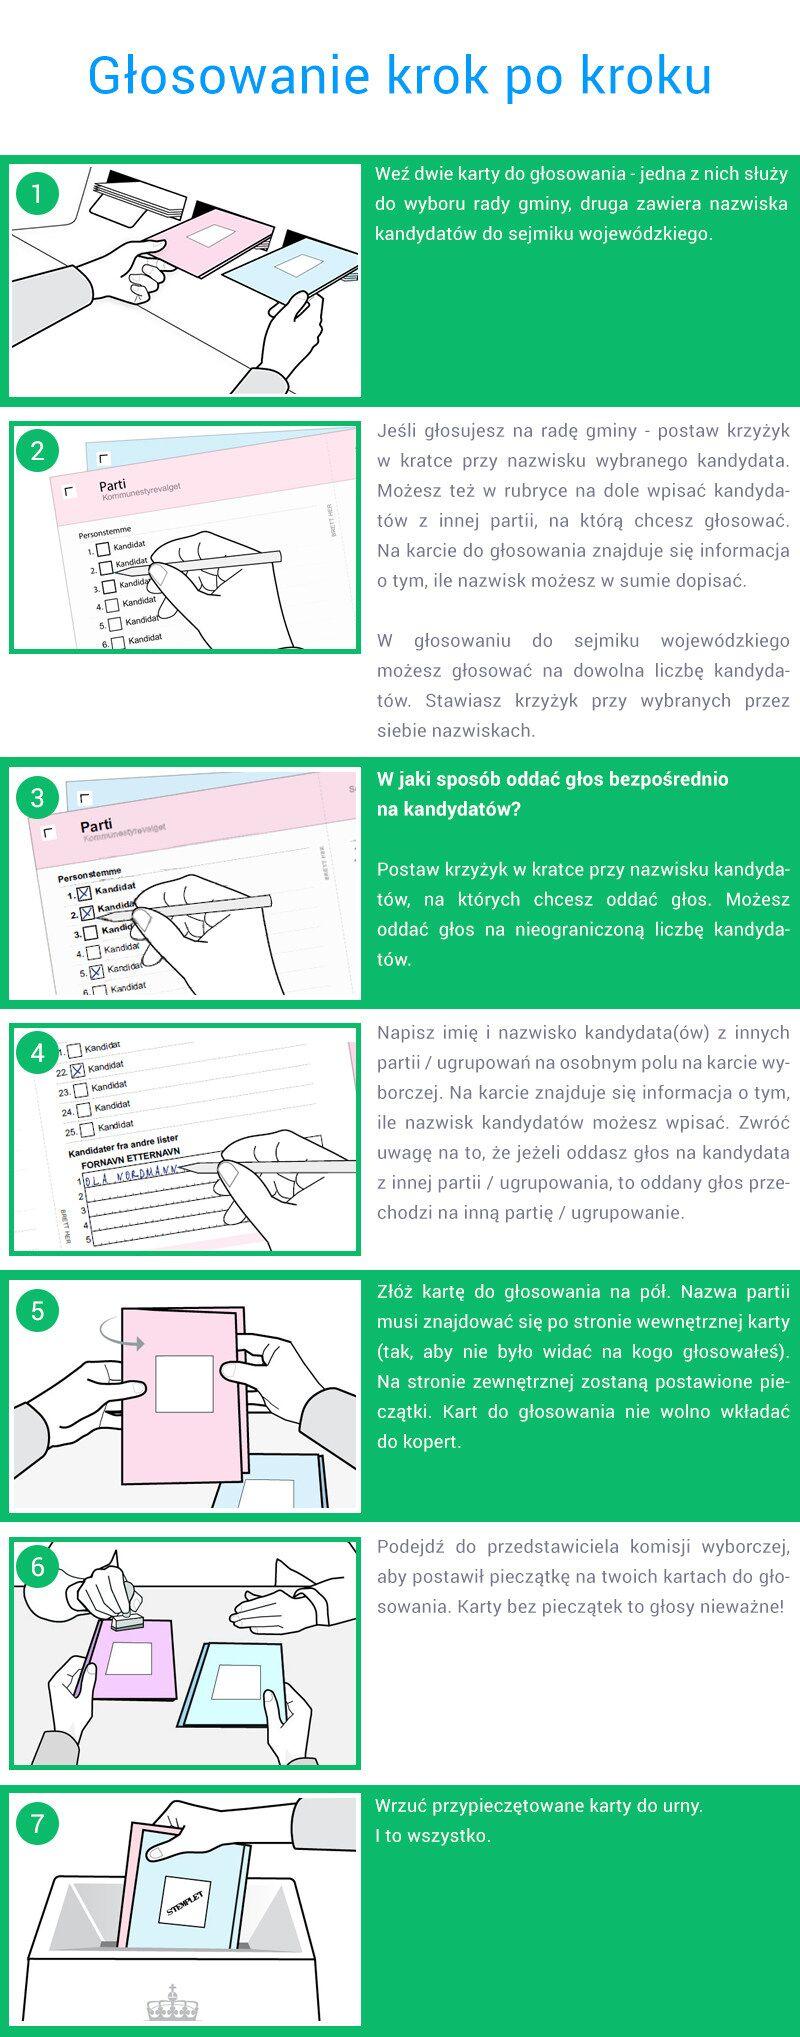 instrukcja_1.jpg